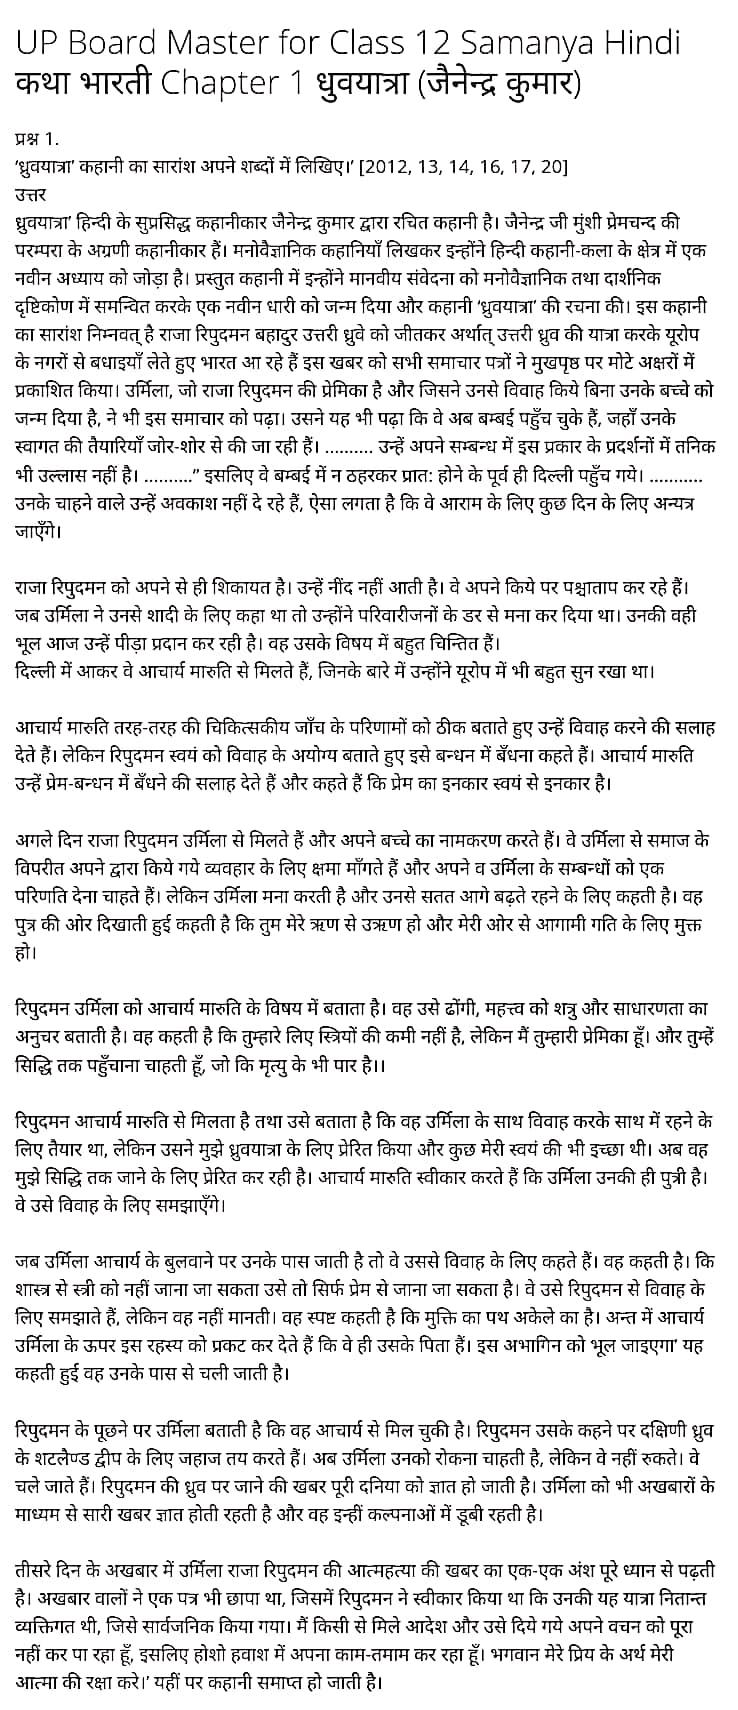 UP Board Solutions for Class 12 Samanya Hindi कथा भारती Chapter 1 धुवयात्रा (जैनेन्द्र कुमार)